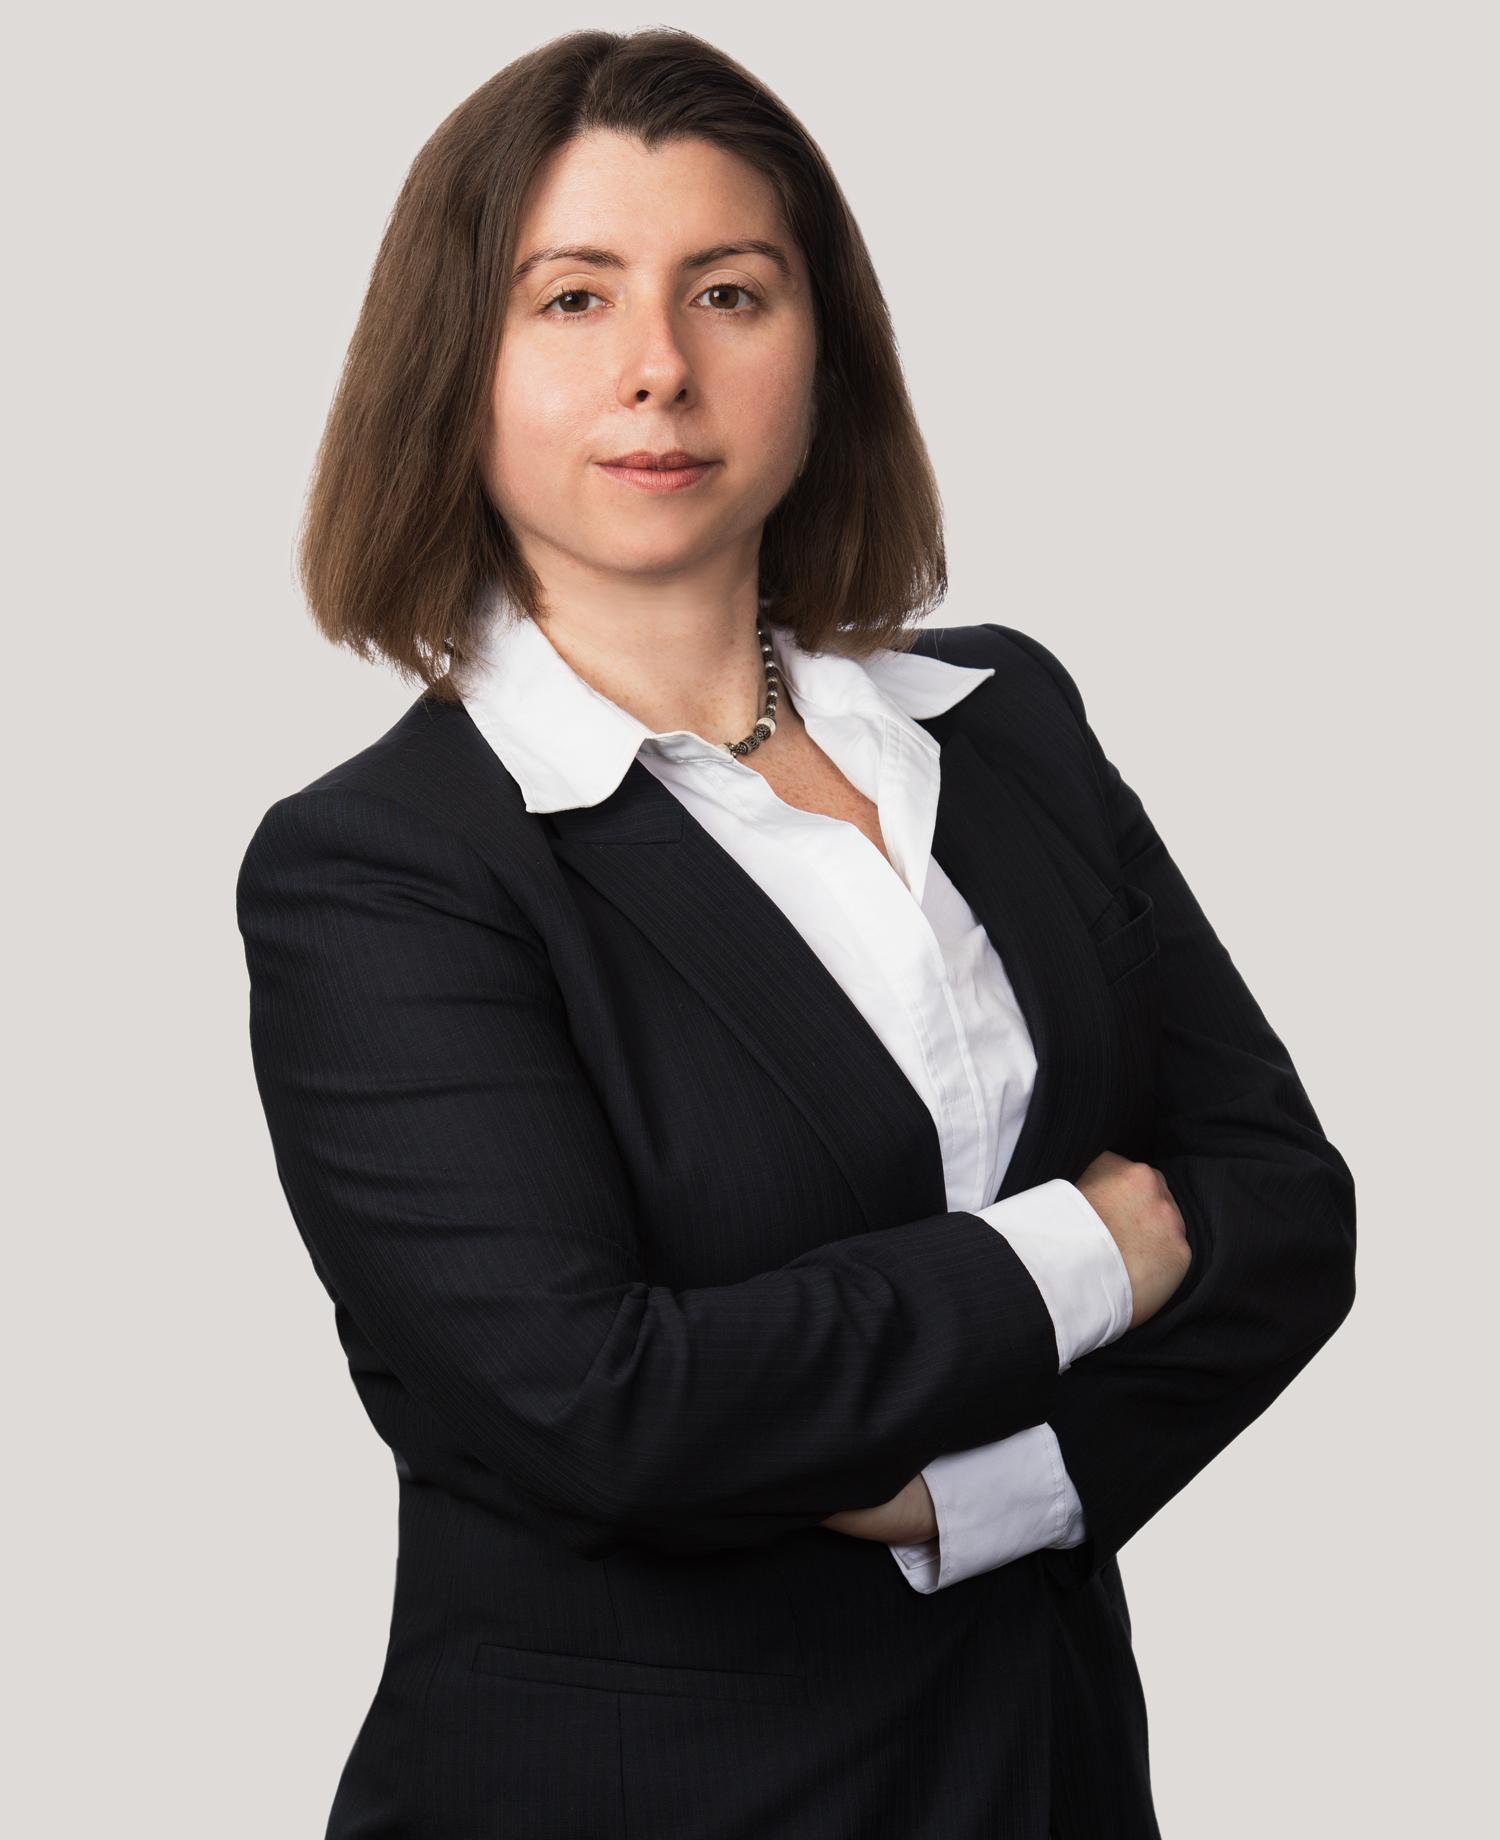 Lauren R. Randell